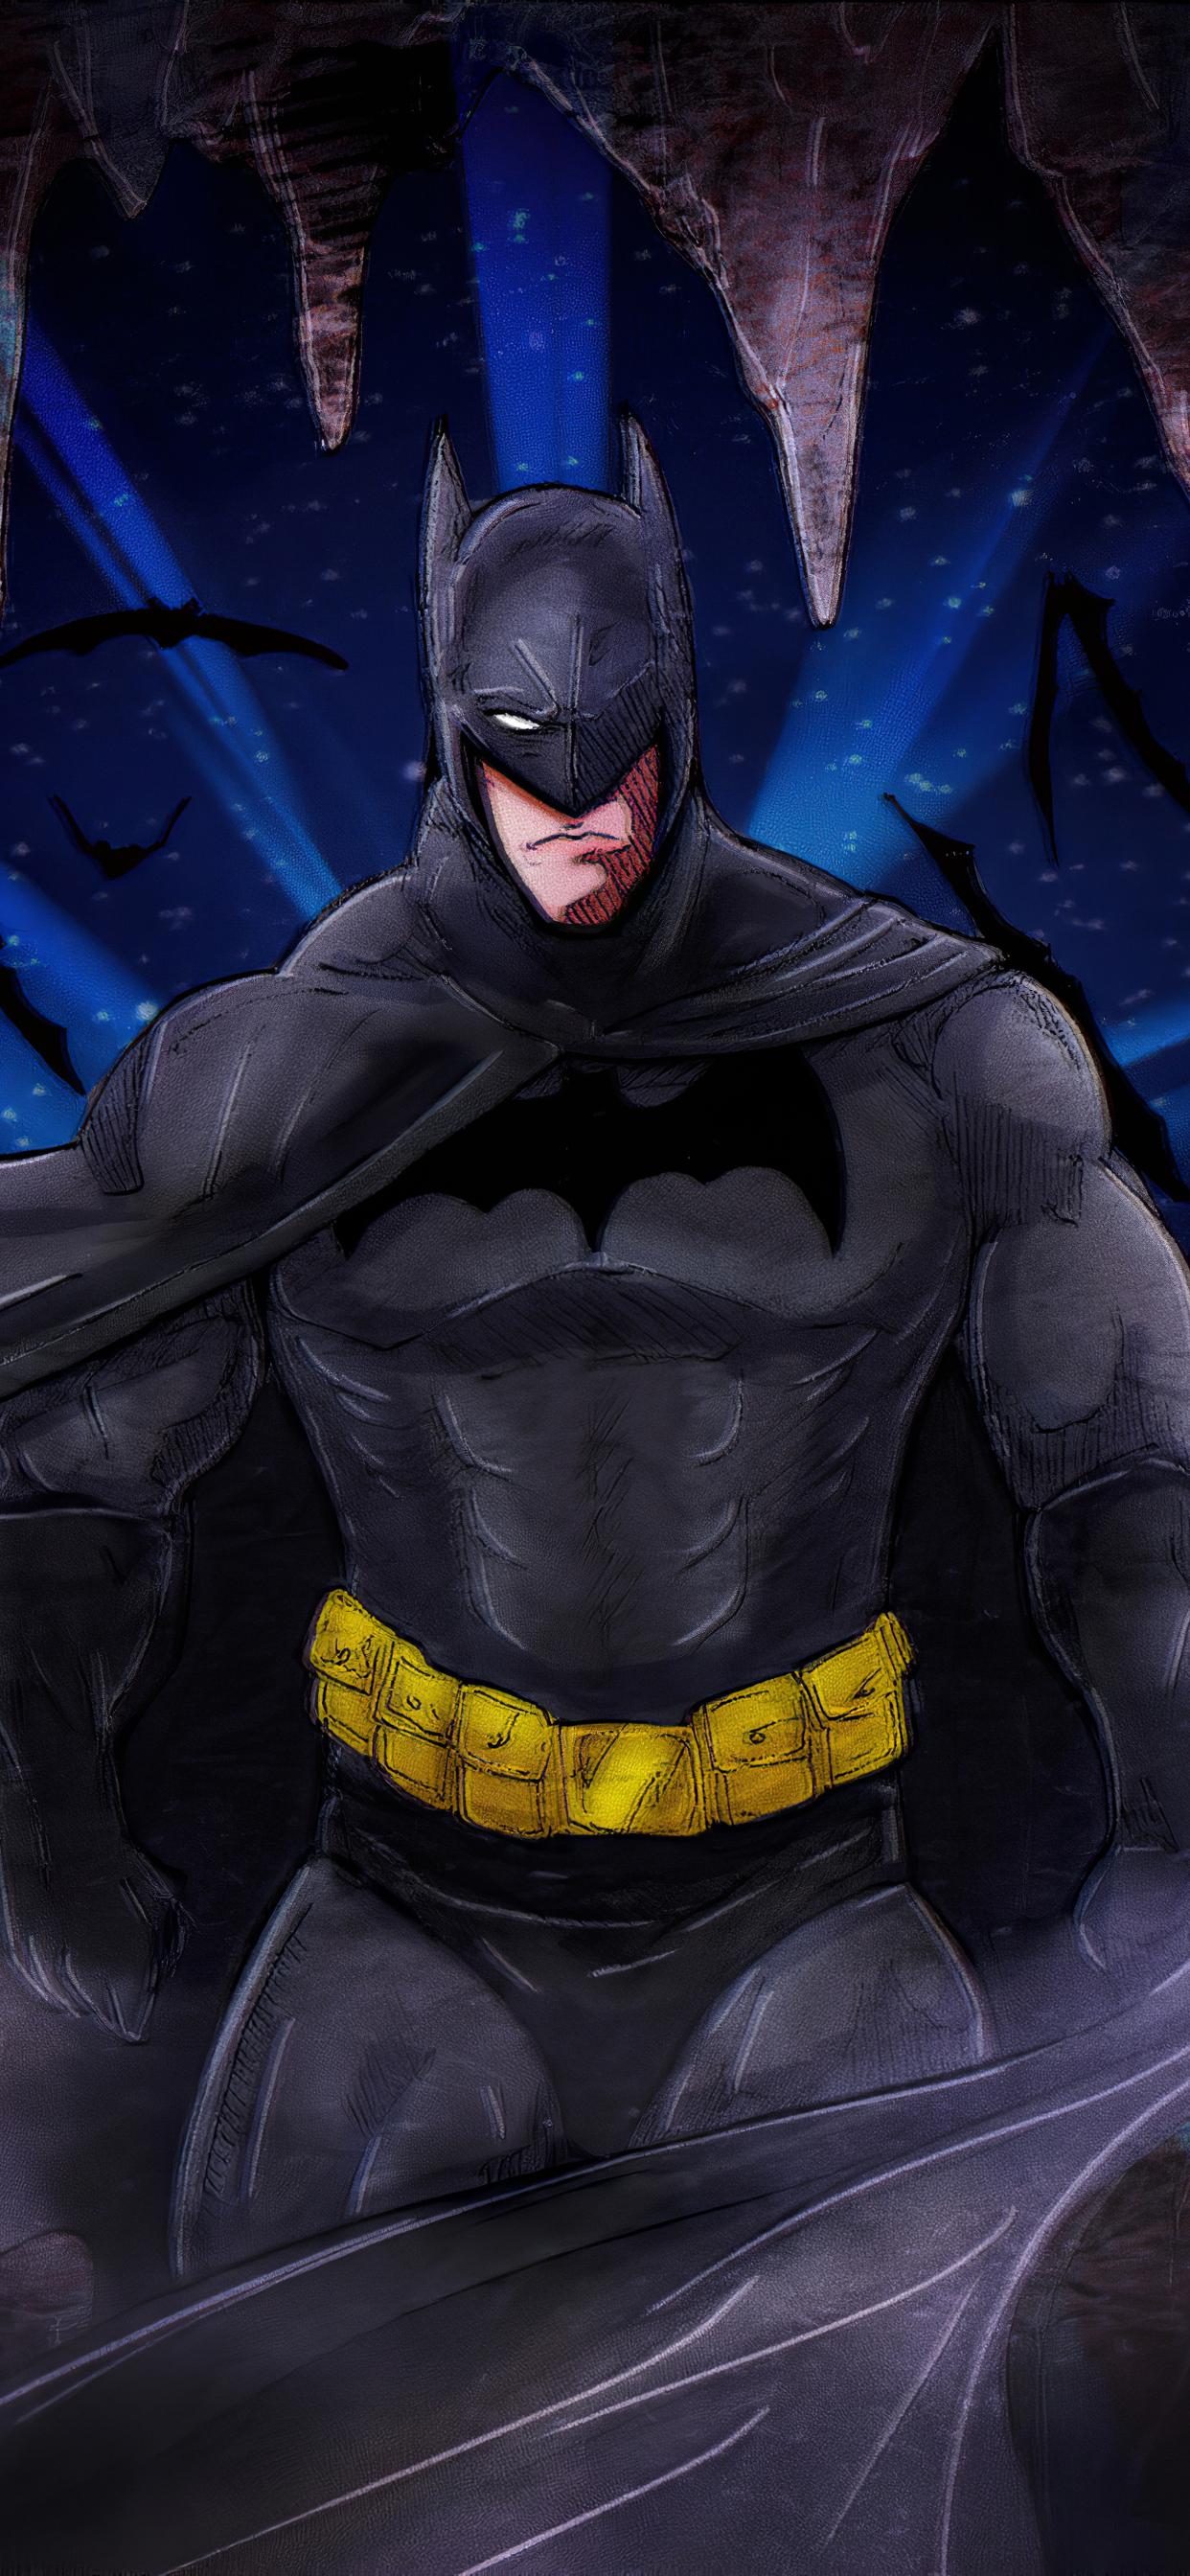 batman-sketchyart-3s.jpg